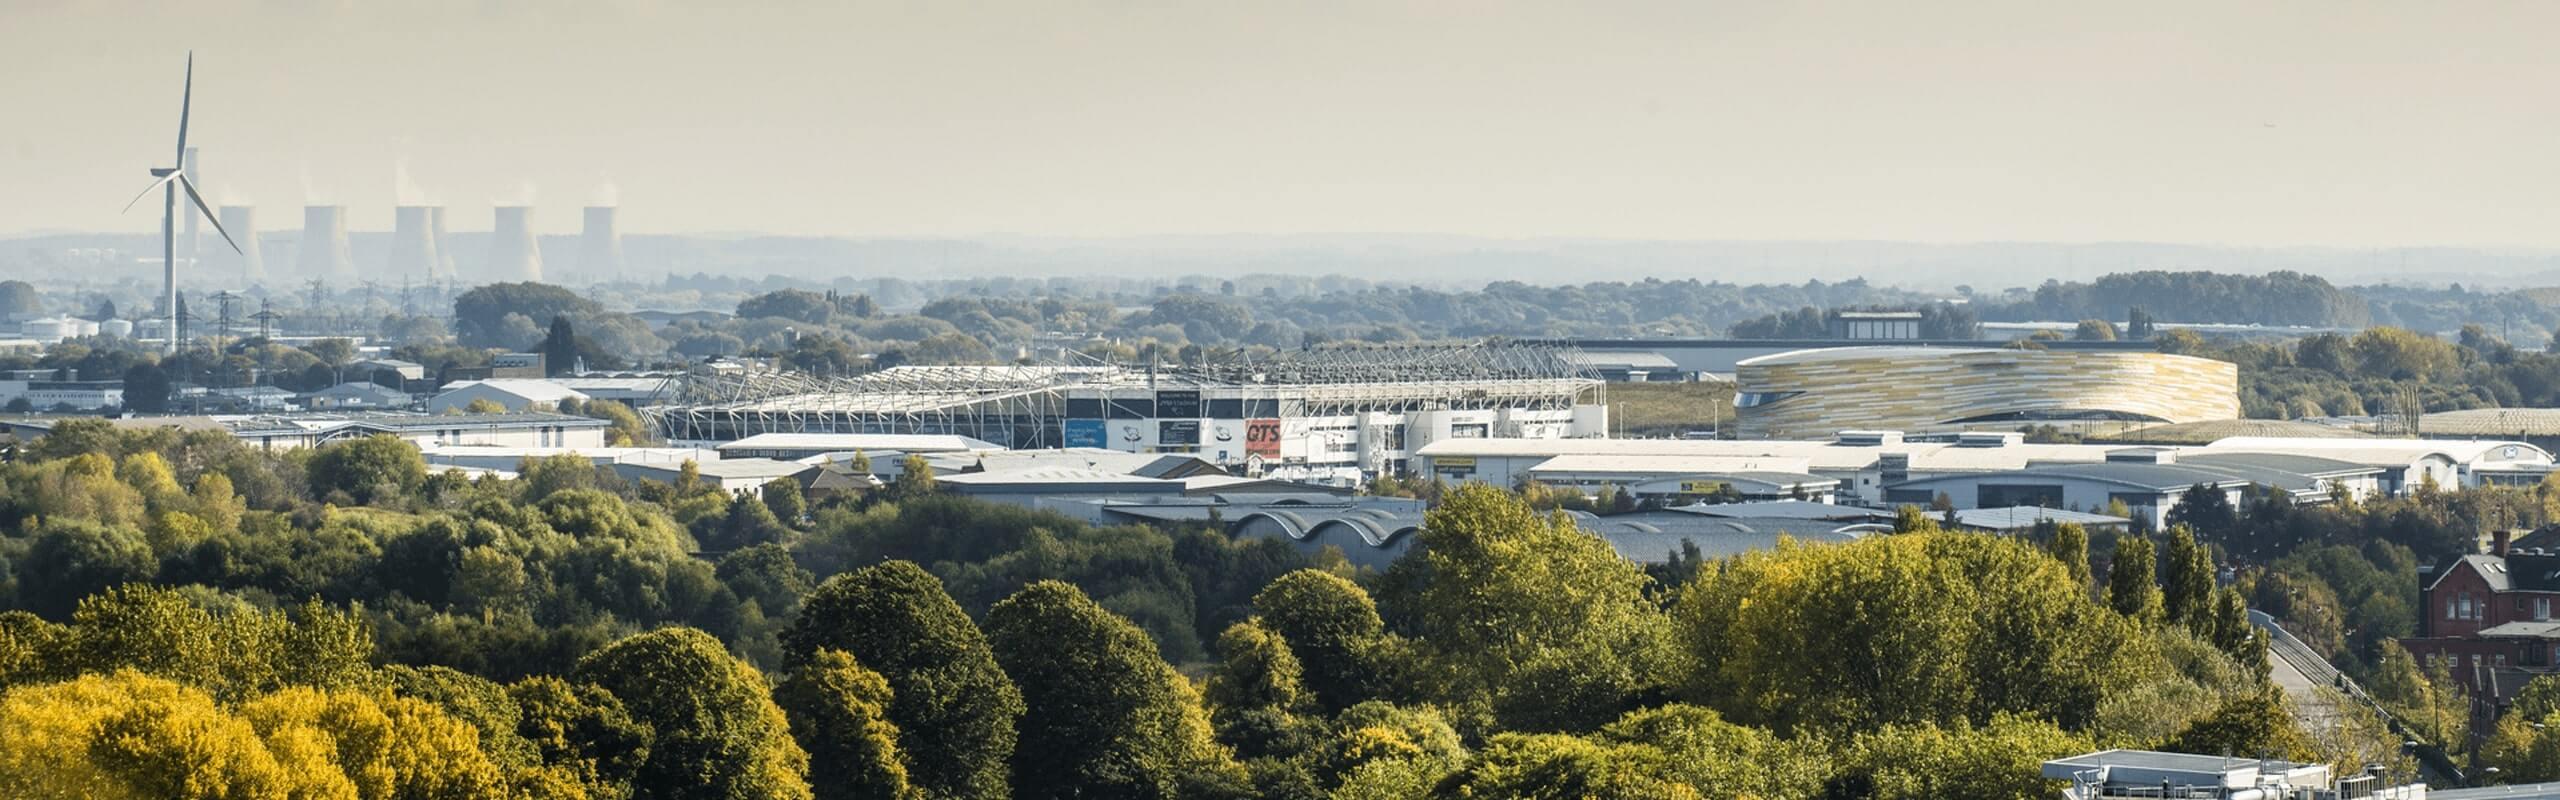 Panaromic view of Derby city